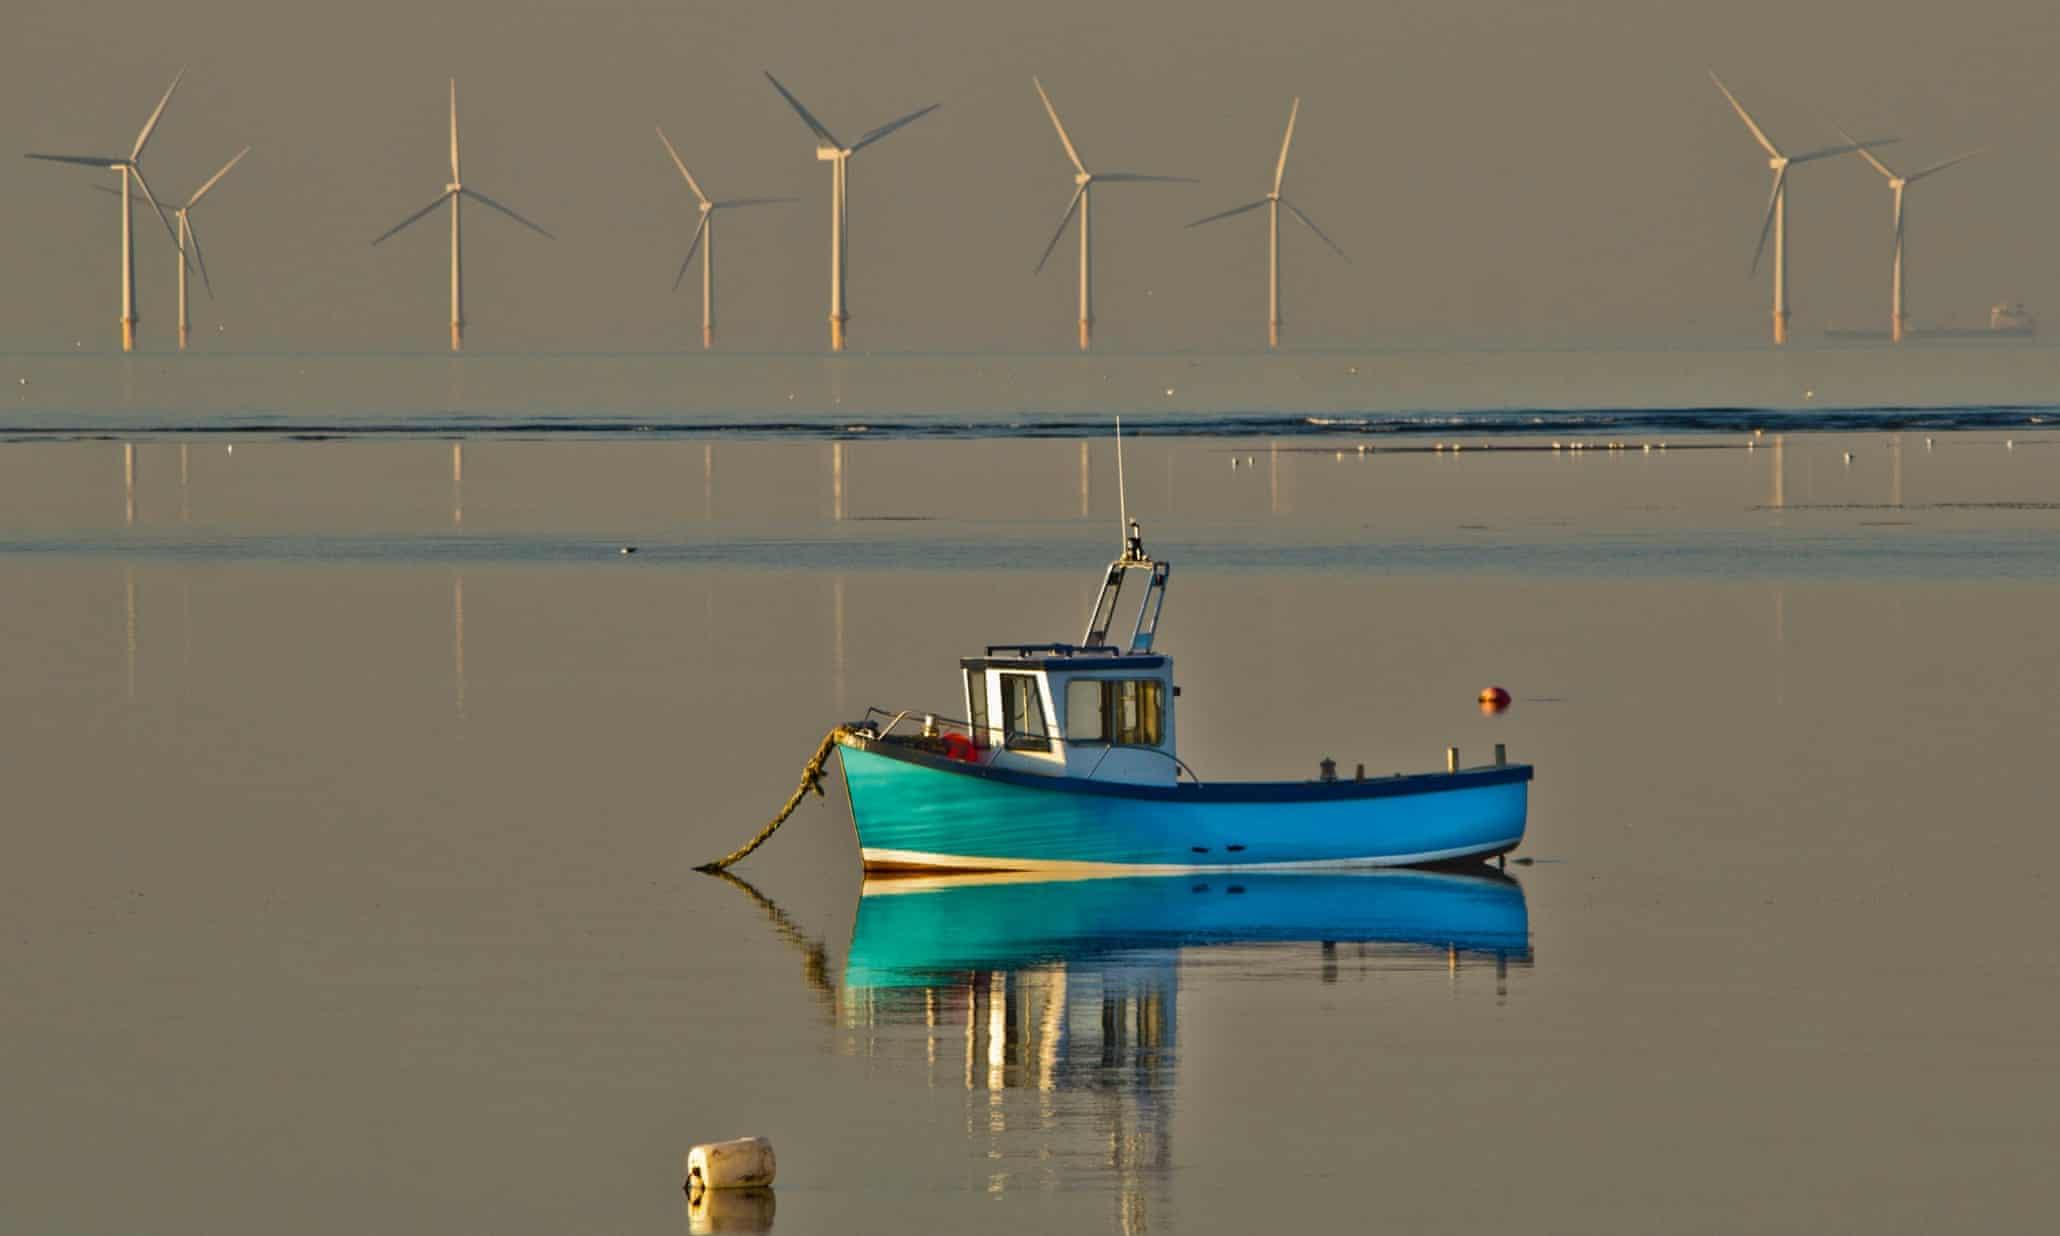 Britain's coastline captured in atmospheric photos for RNLI contest – in pictures